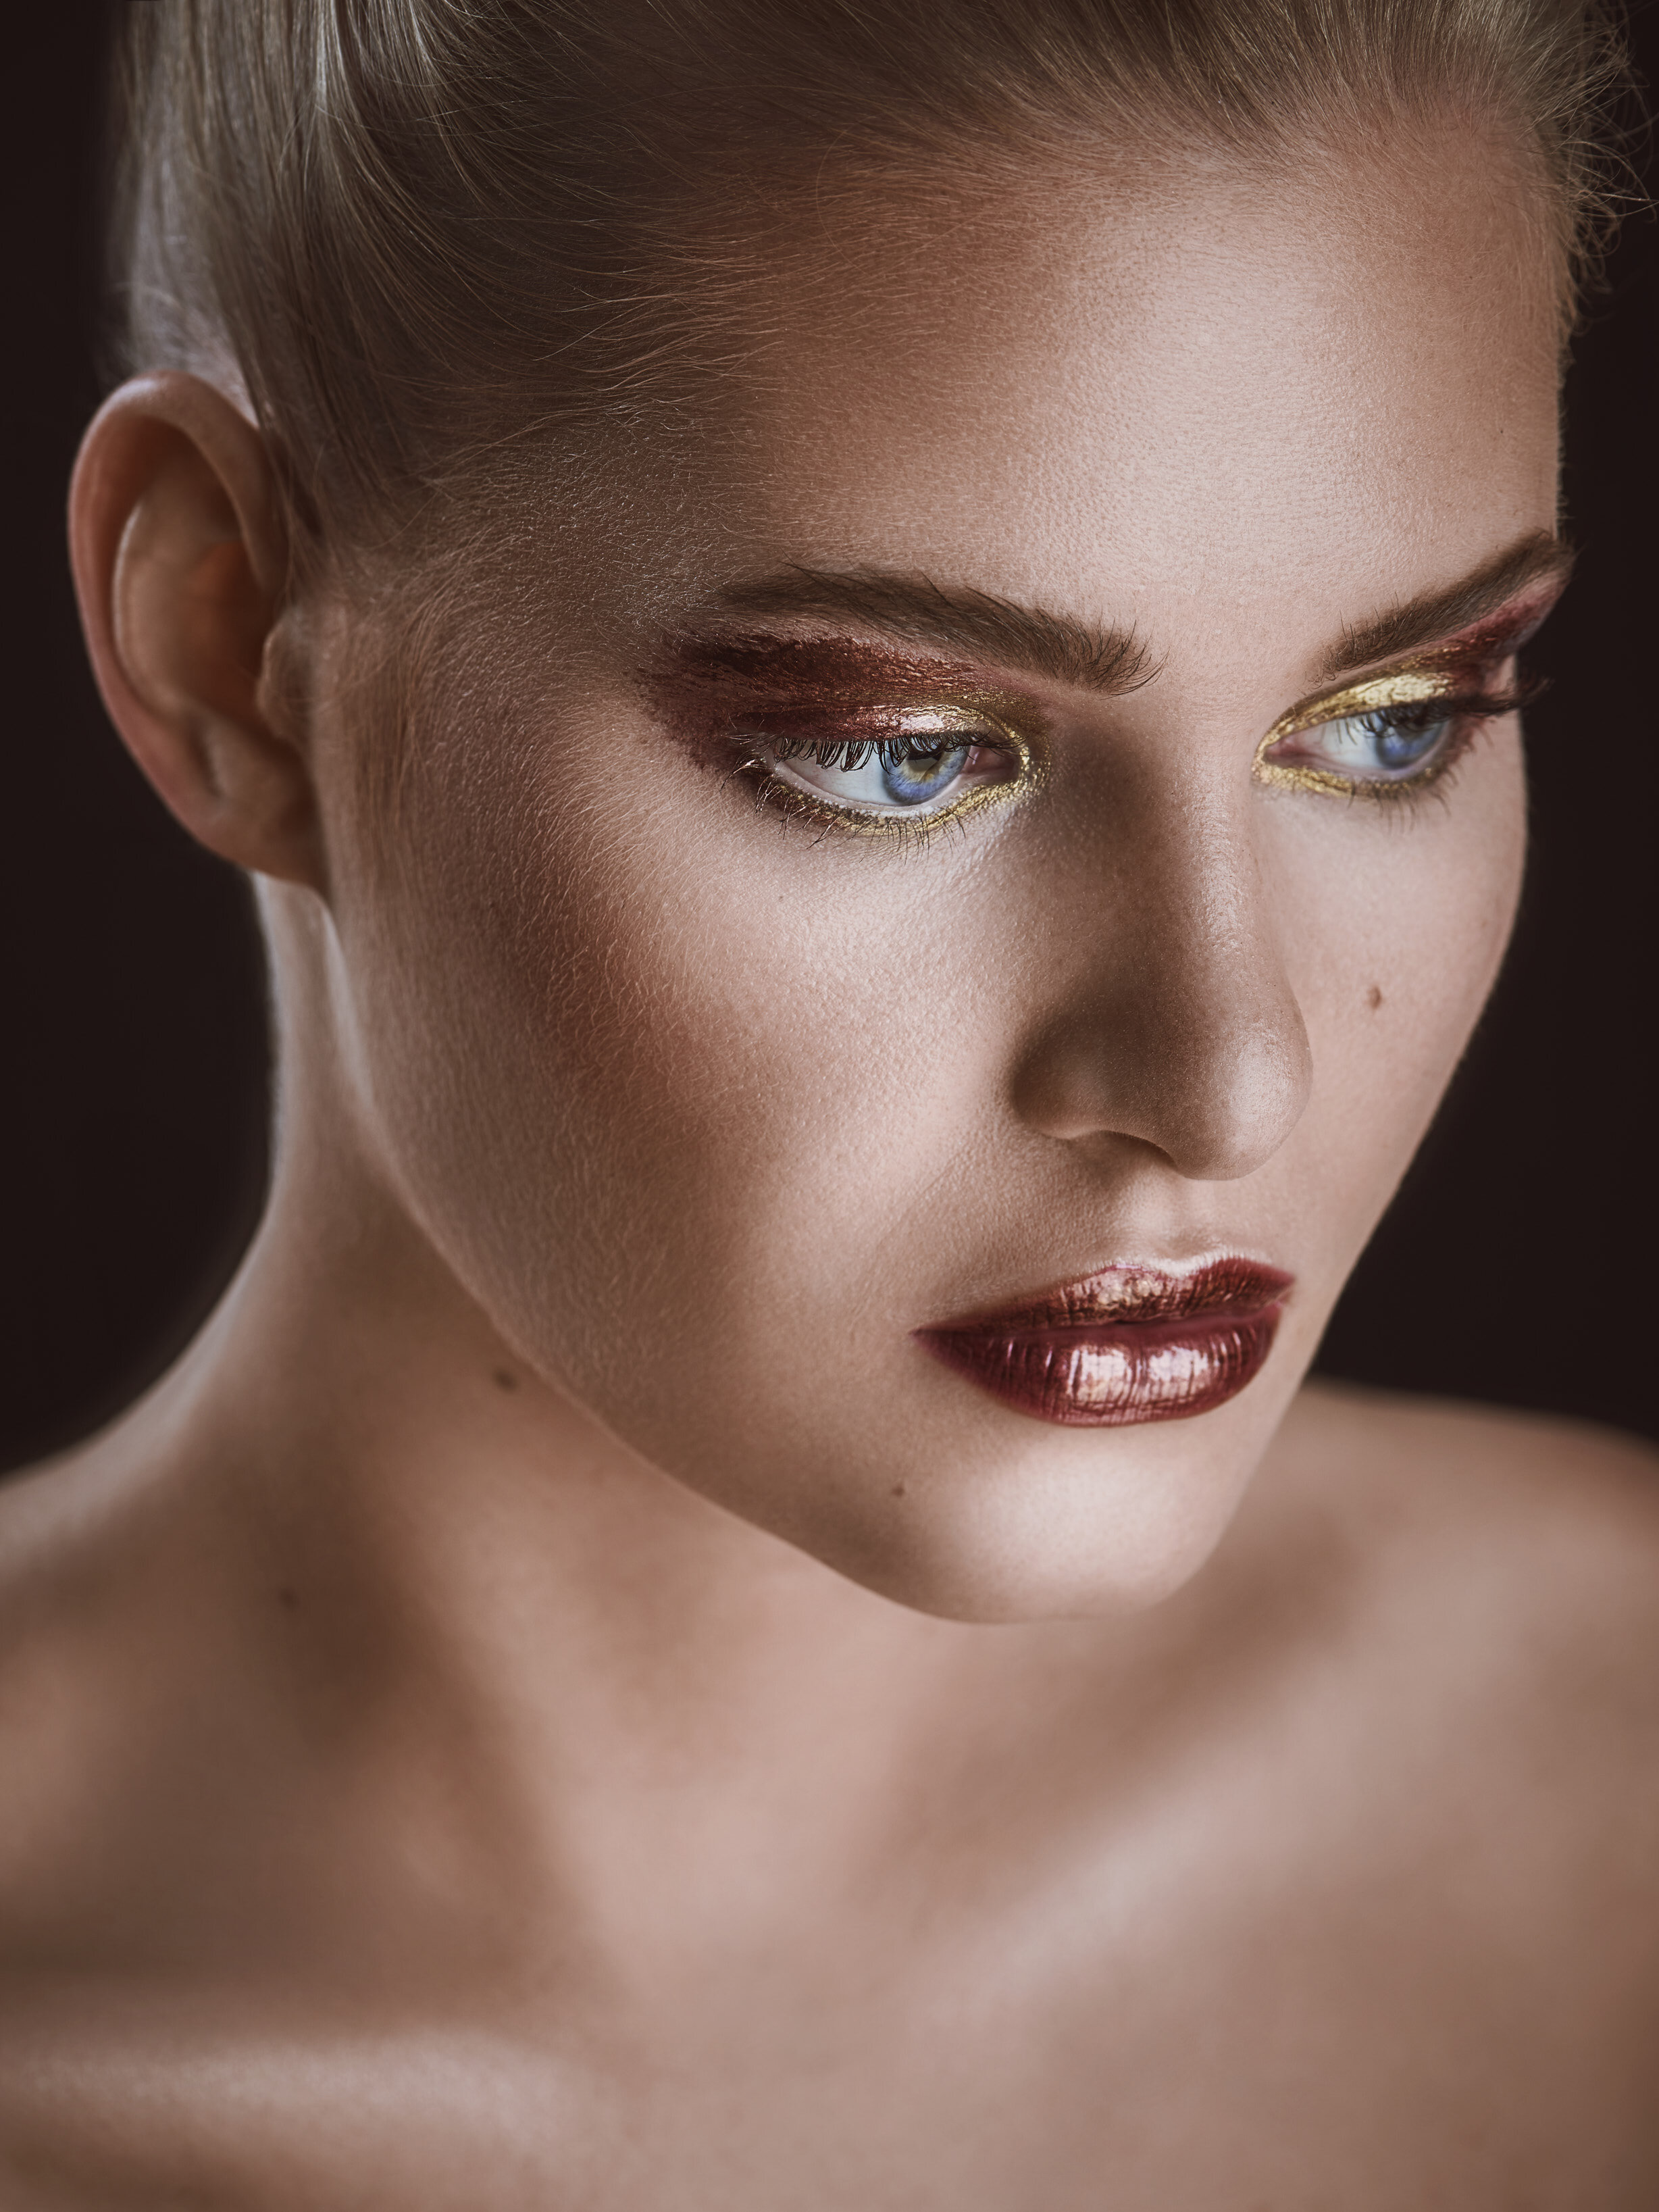 2019-08-10-ahley-creativ-makeup29311.jpg